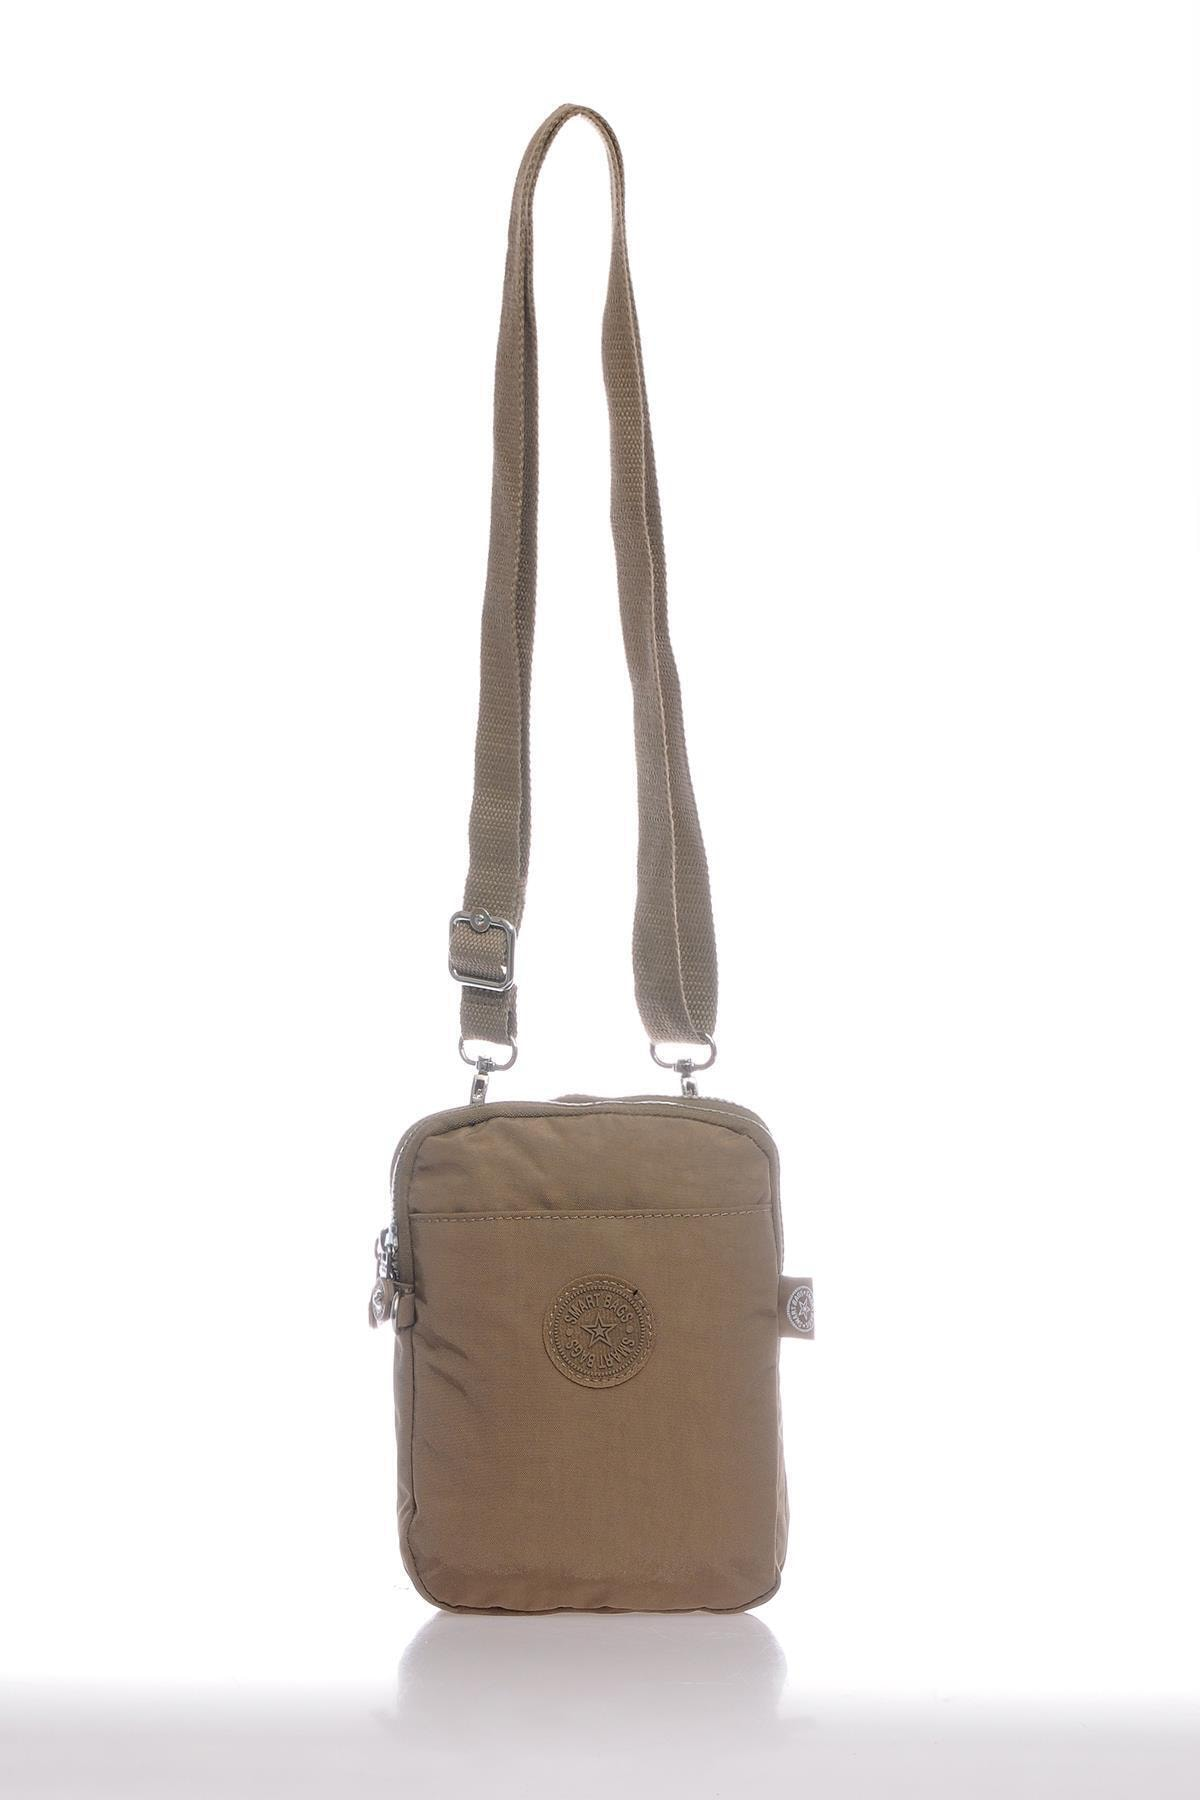 SMART BAGS Smb3059-0007 A.kahverengi Kadın Çapraz Çanta 1